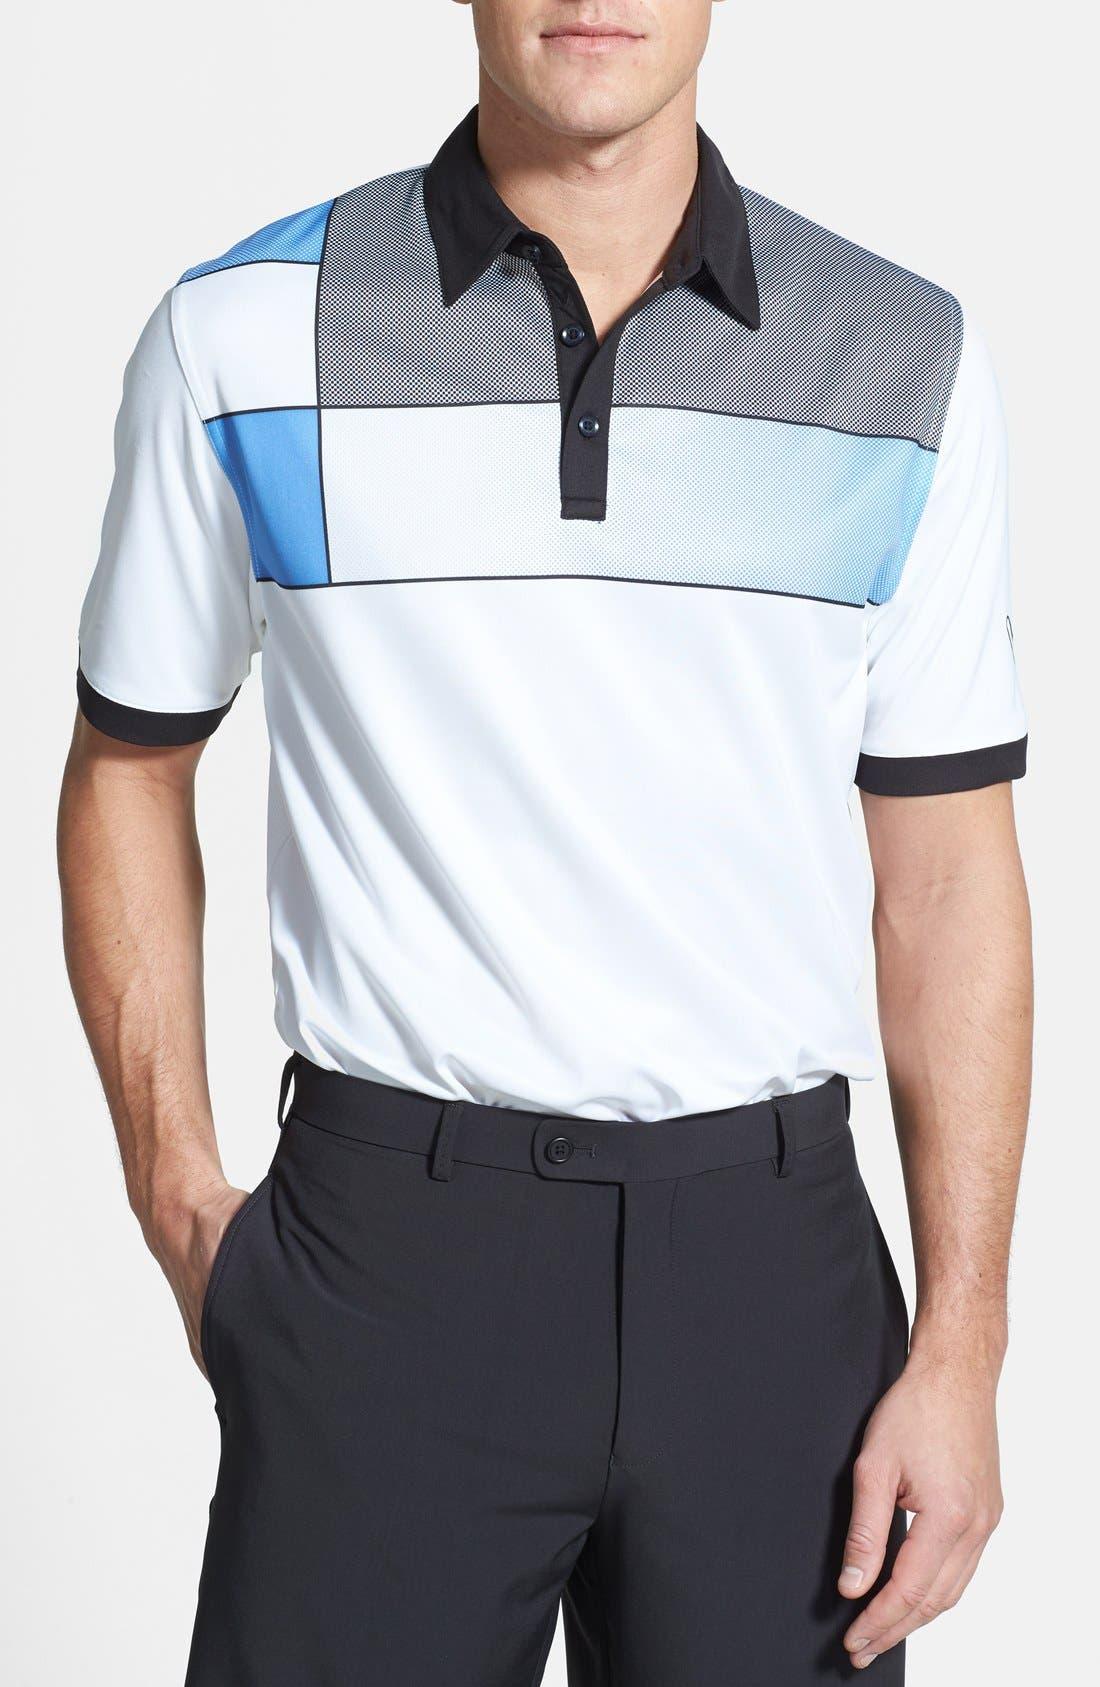 Alternate Image 1 Selected - Callaway Golf® 'Vibe' Opti-Dri Moisture Wicking Polo